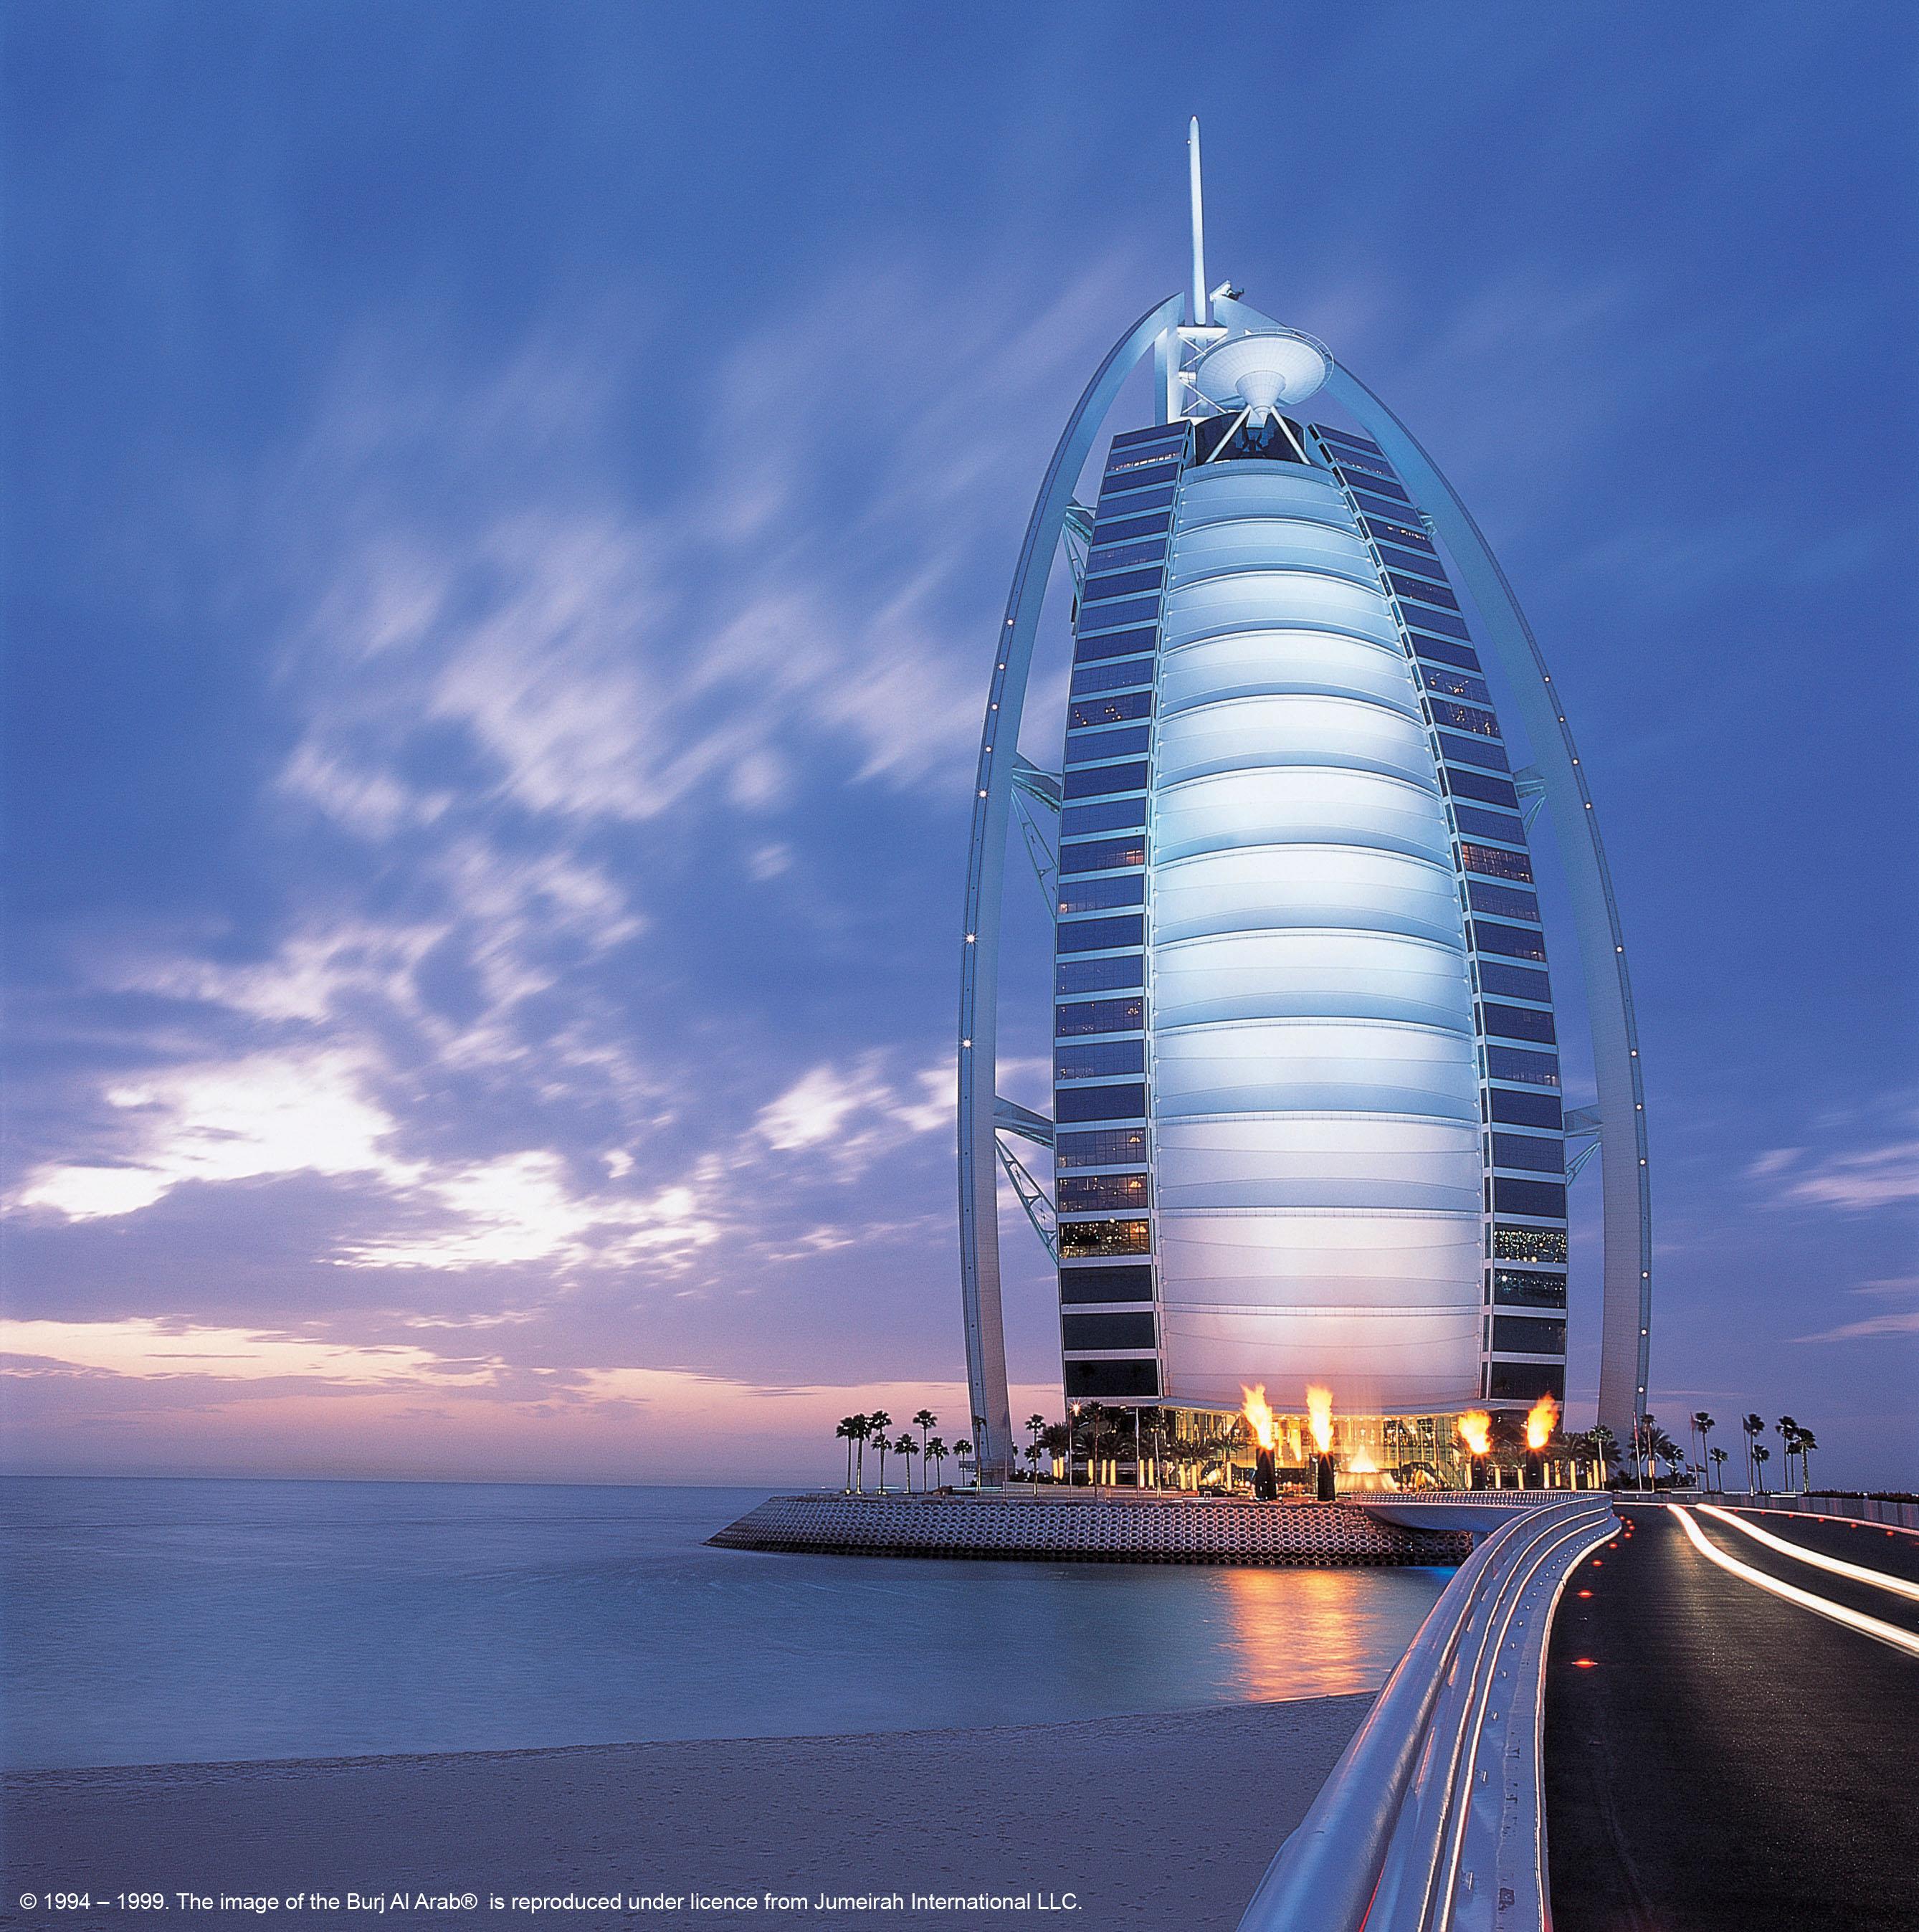 Burj Al Arab Jumeirah Atkins